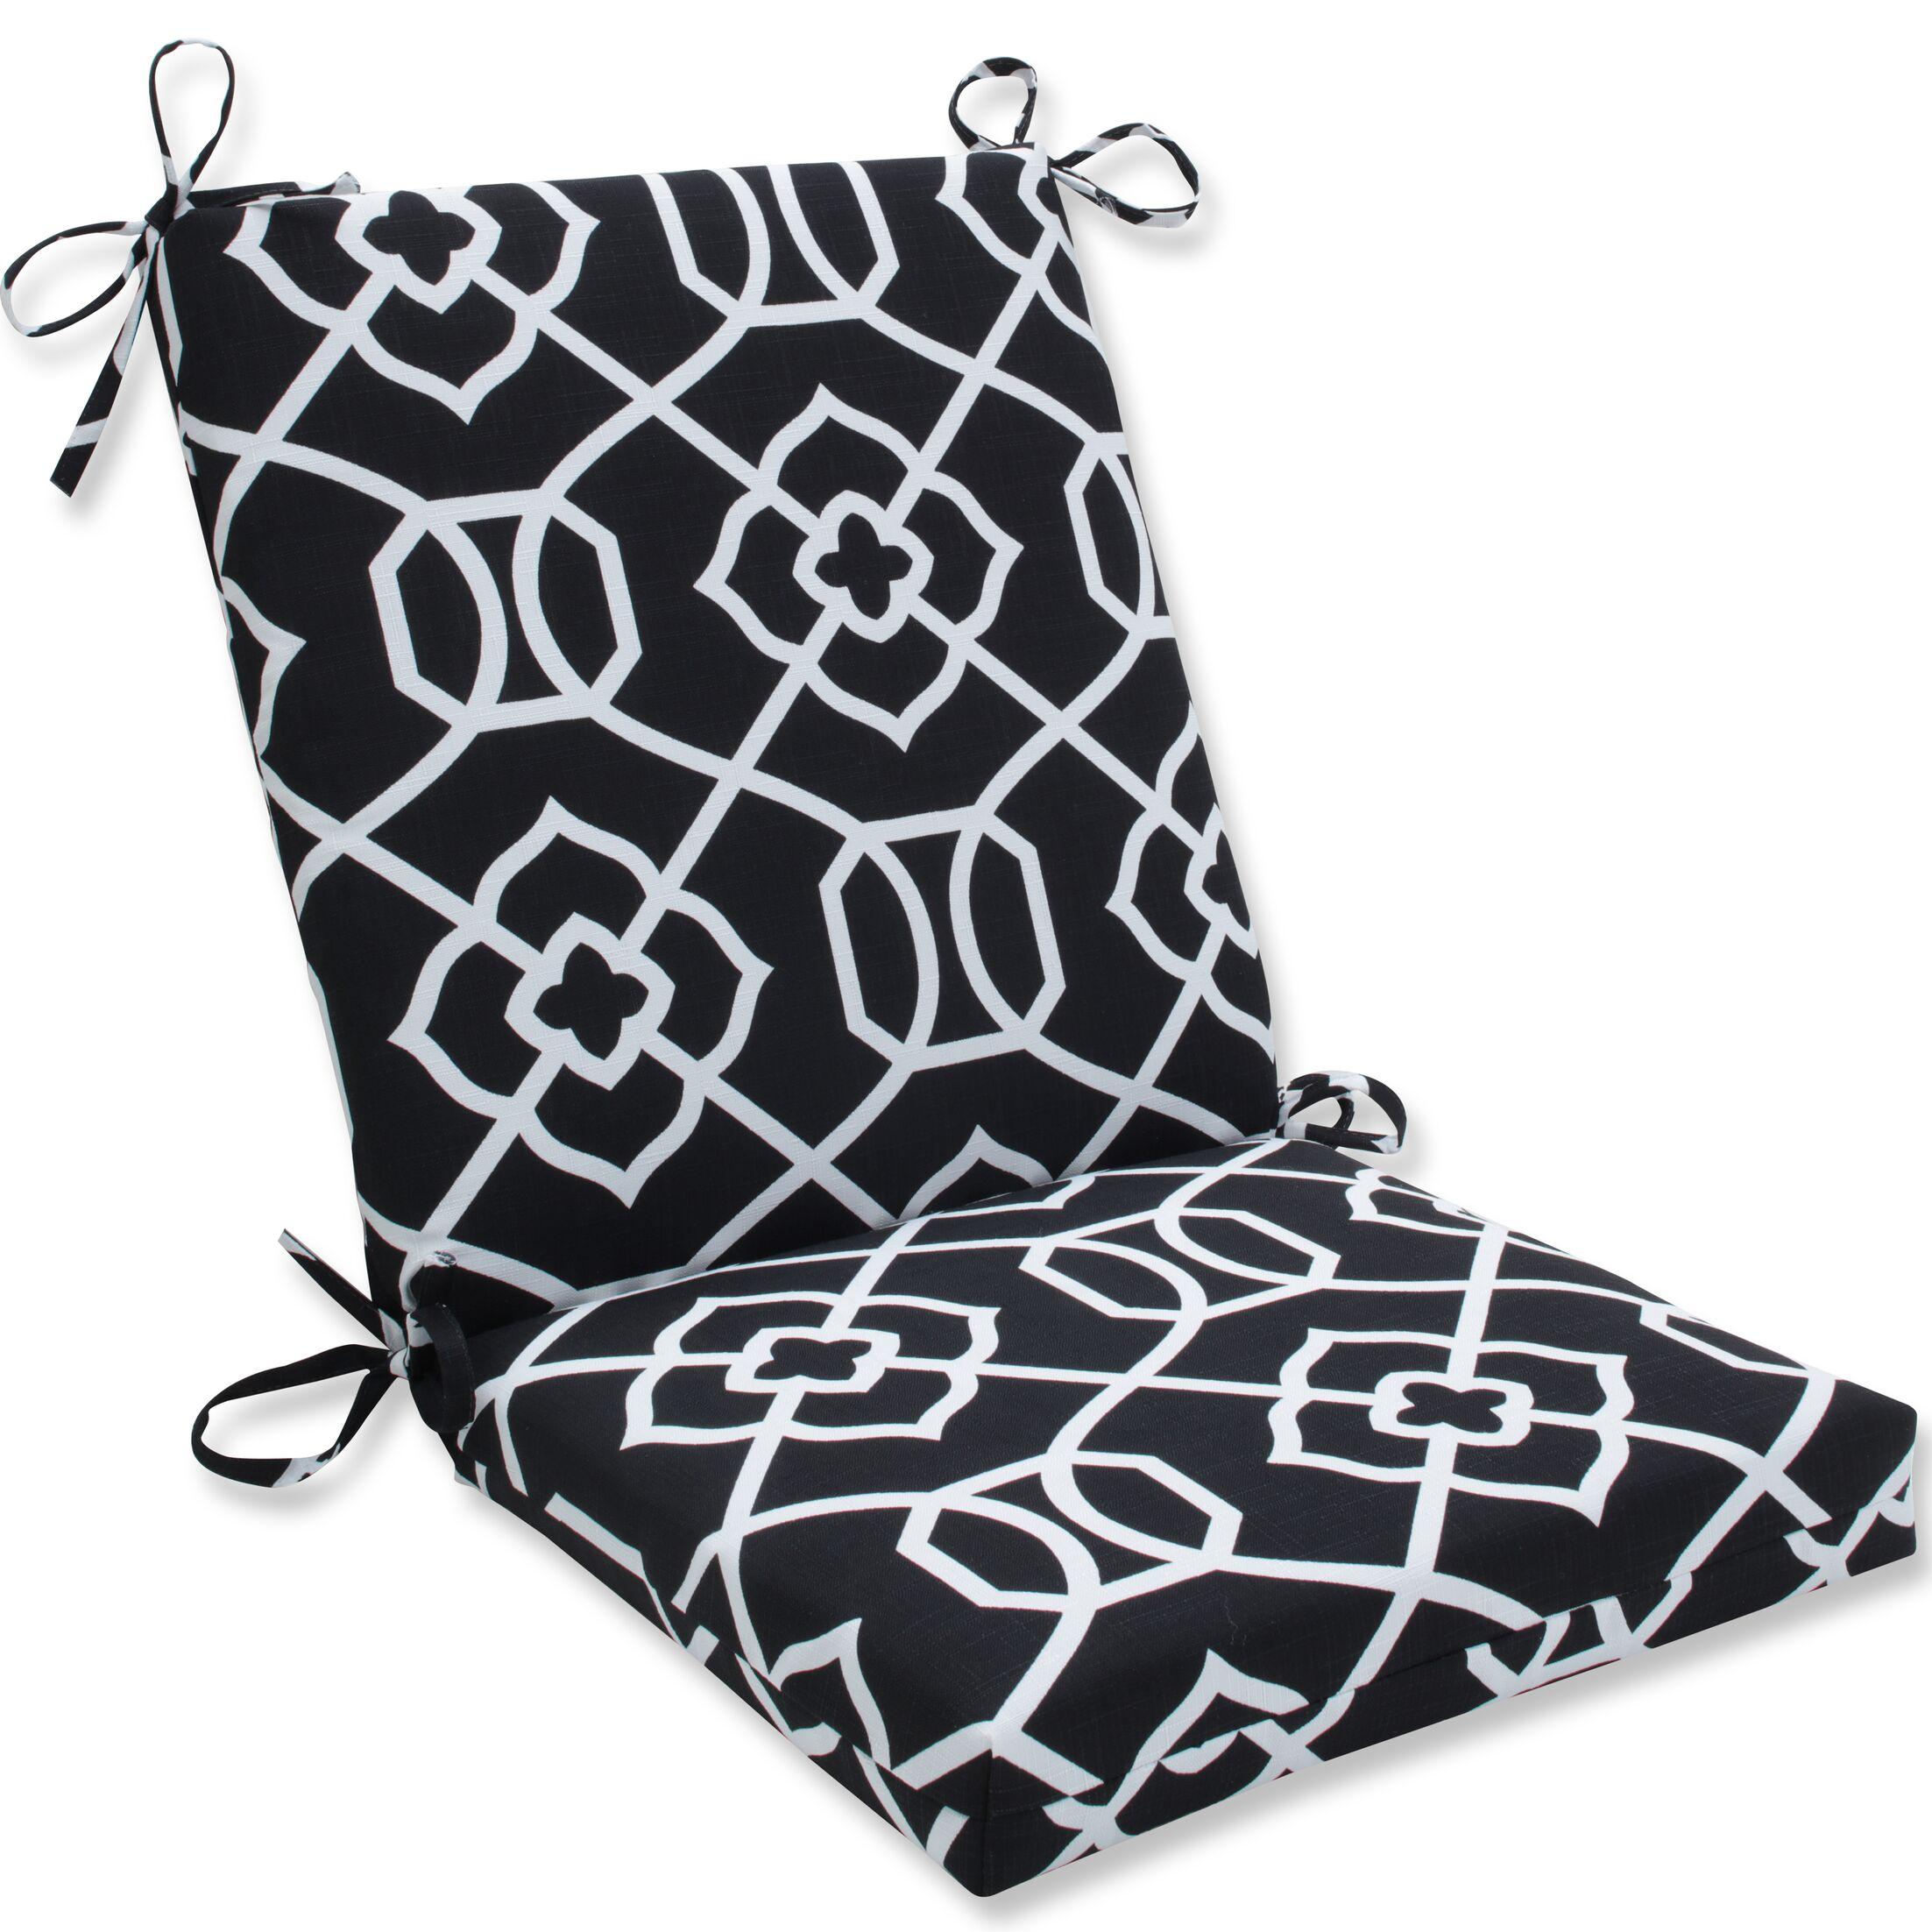 Kirkland Indoor/Outdoor Dining Chair Cushion